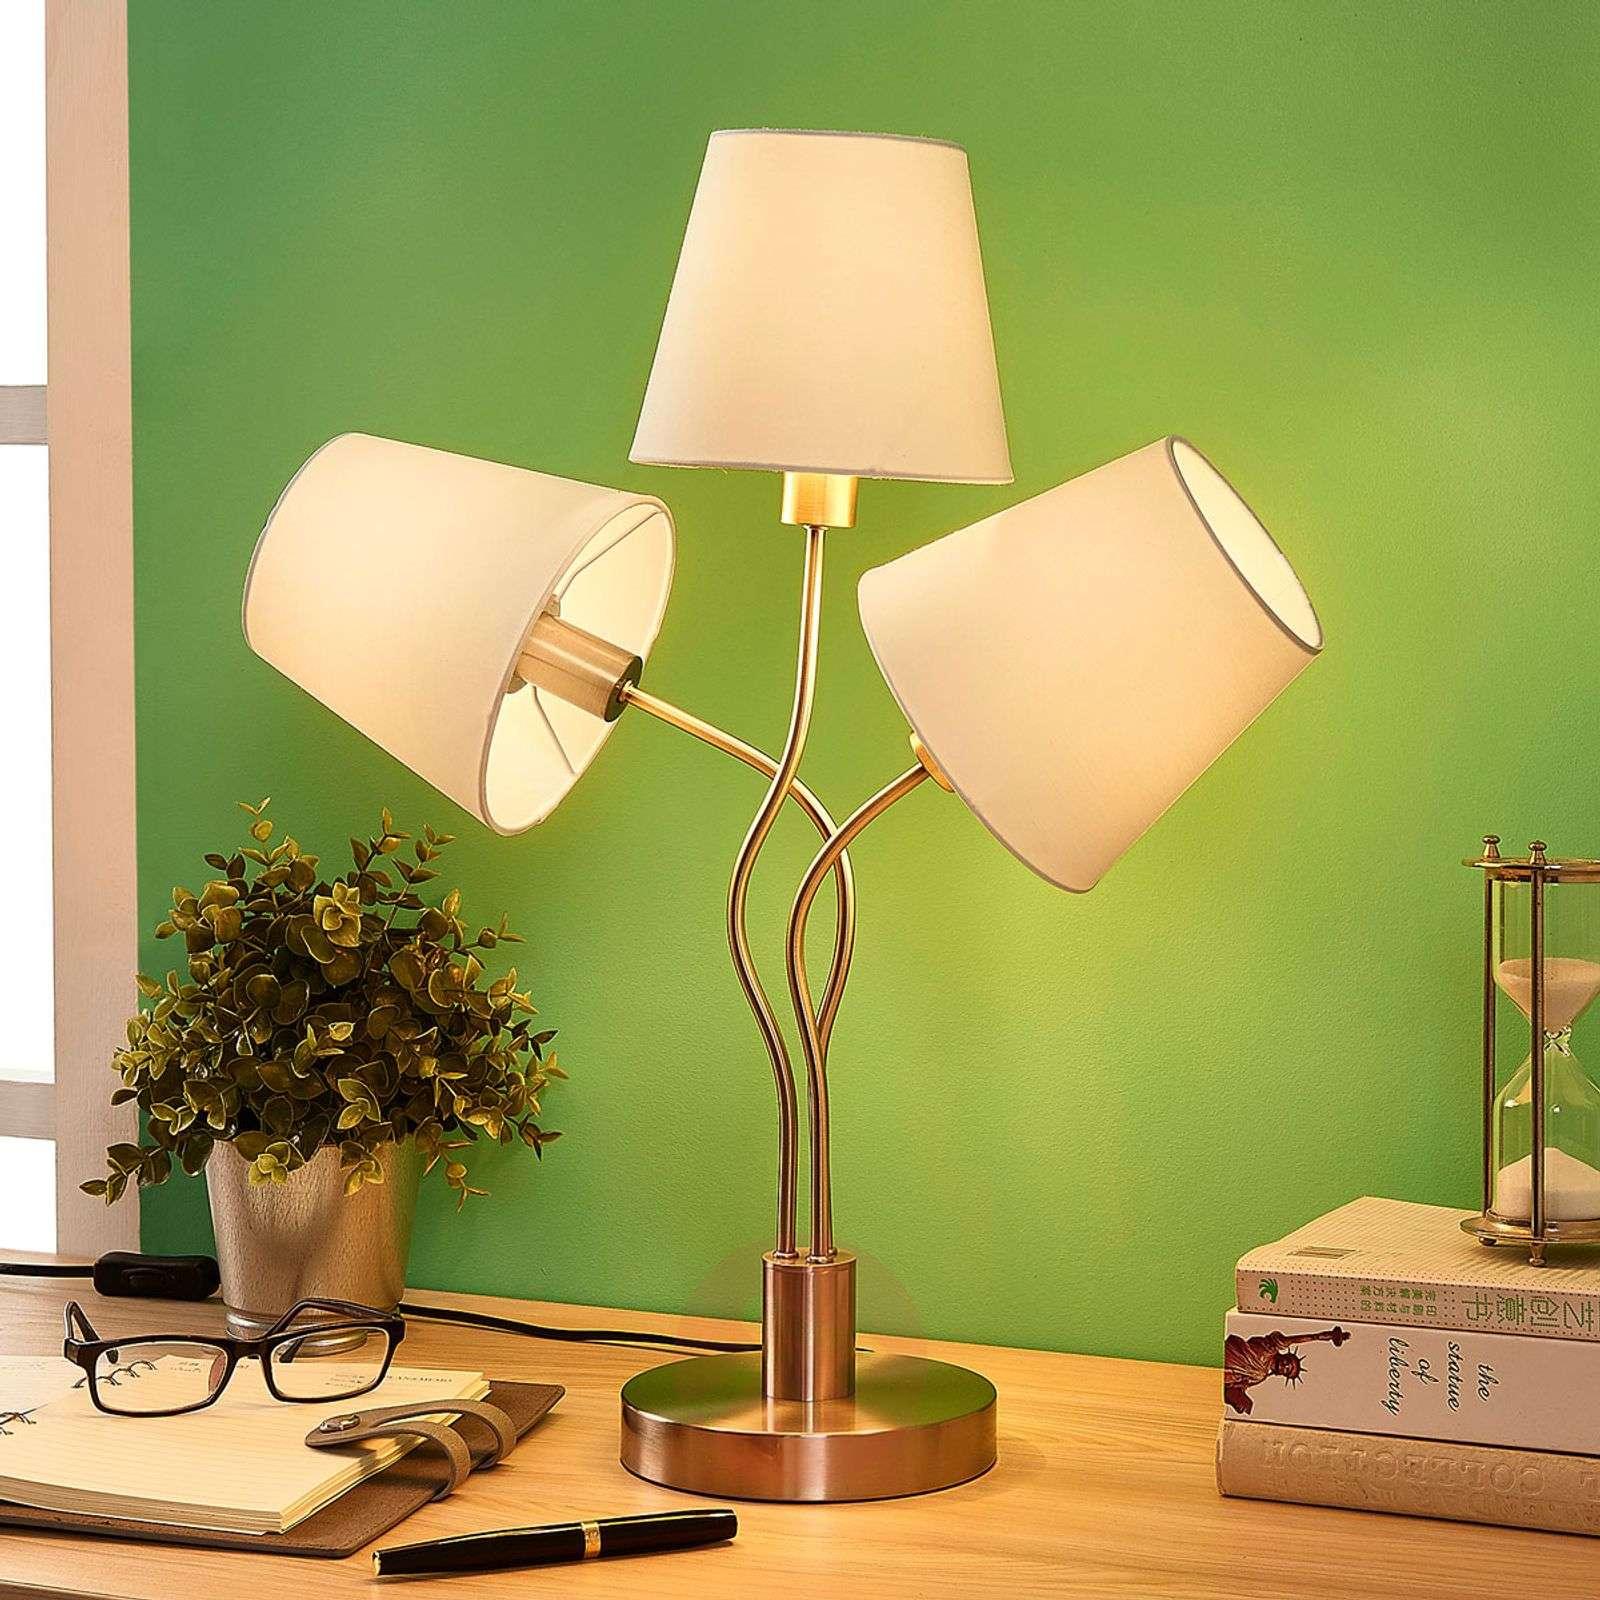 Three-bulb table lamp Sharon, fabric lampshades-9621250-02